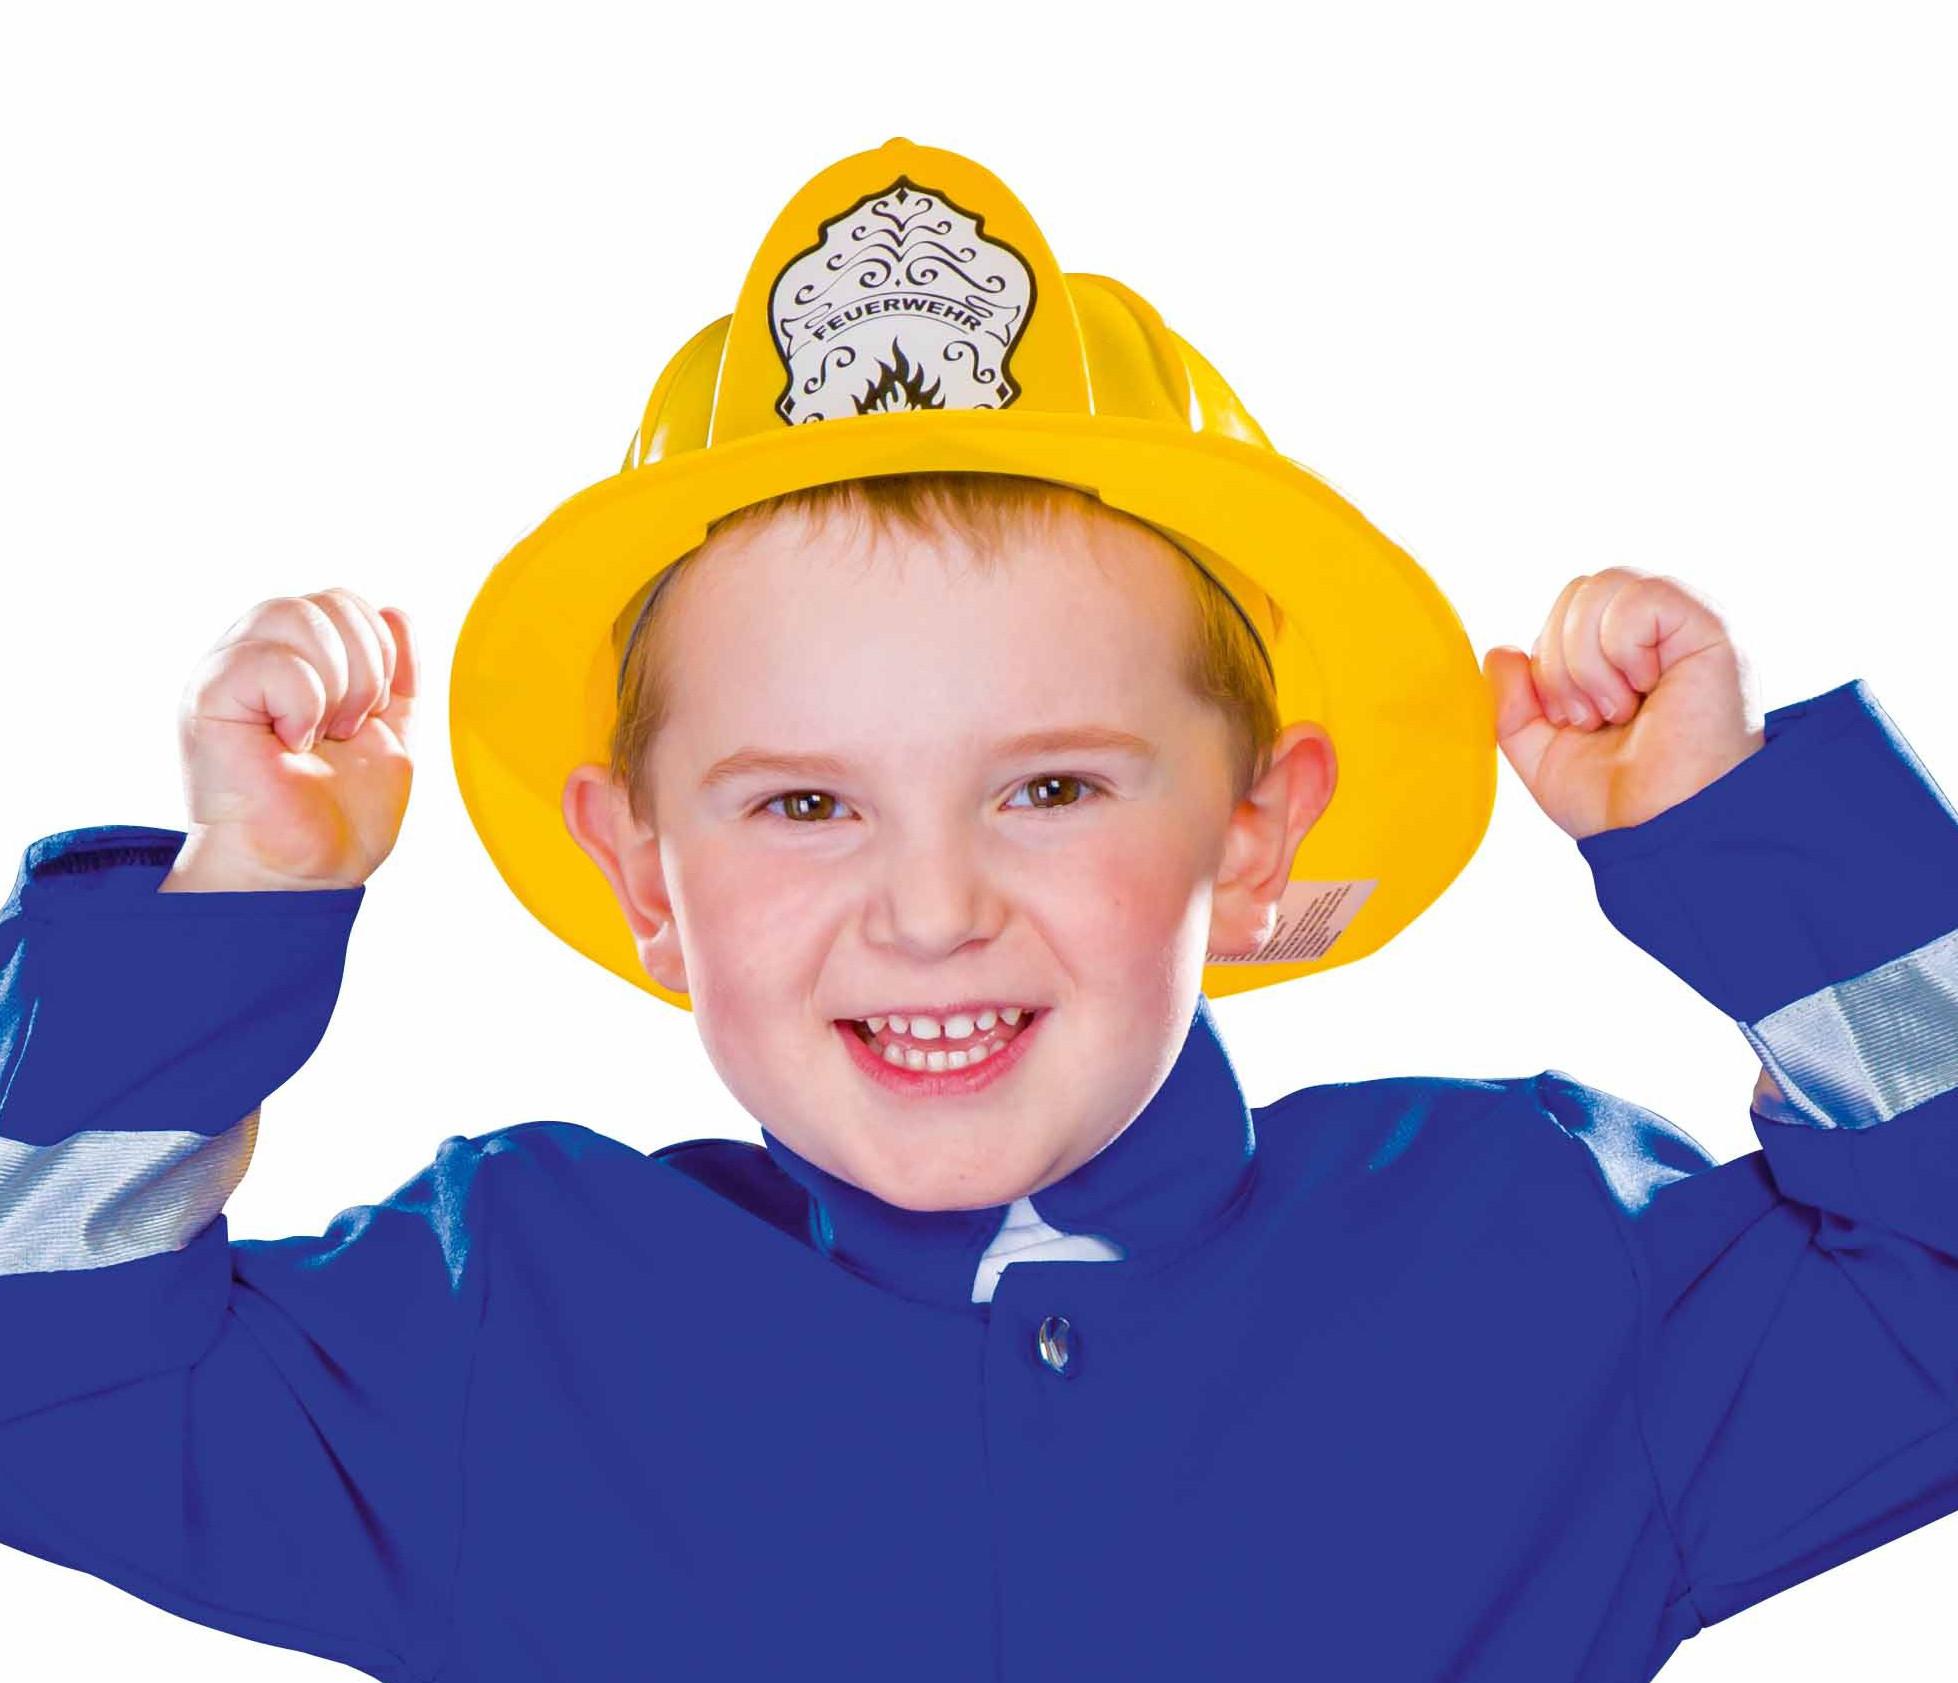 Gelber Feuerwehrhelm Kinder Feuerwehrmann Helm Hut Karneval Fasching